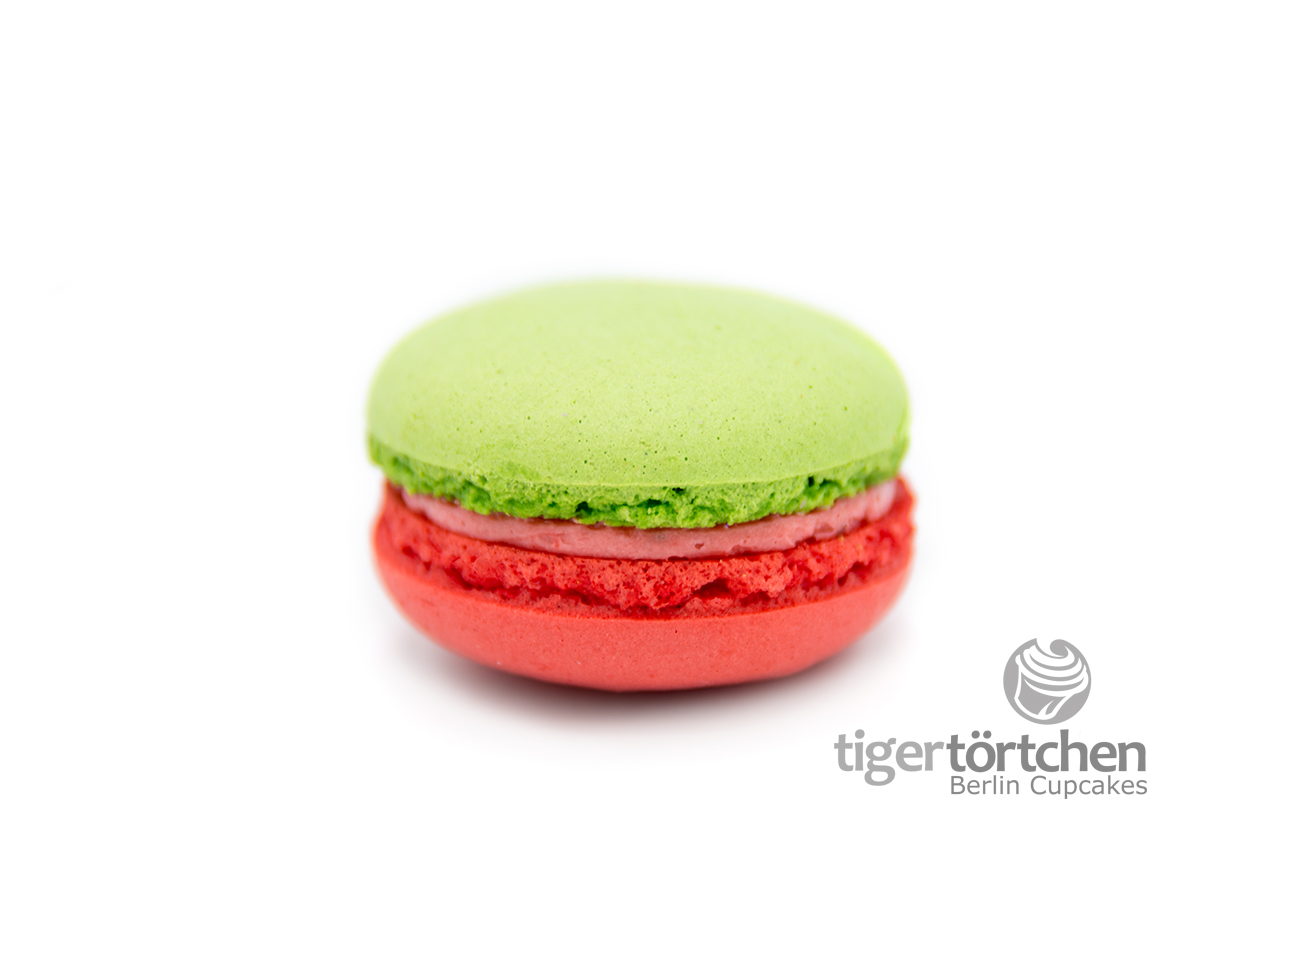 Macaron Erdbeer-Basilikum tigertörtchen Berlin